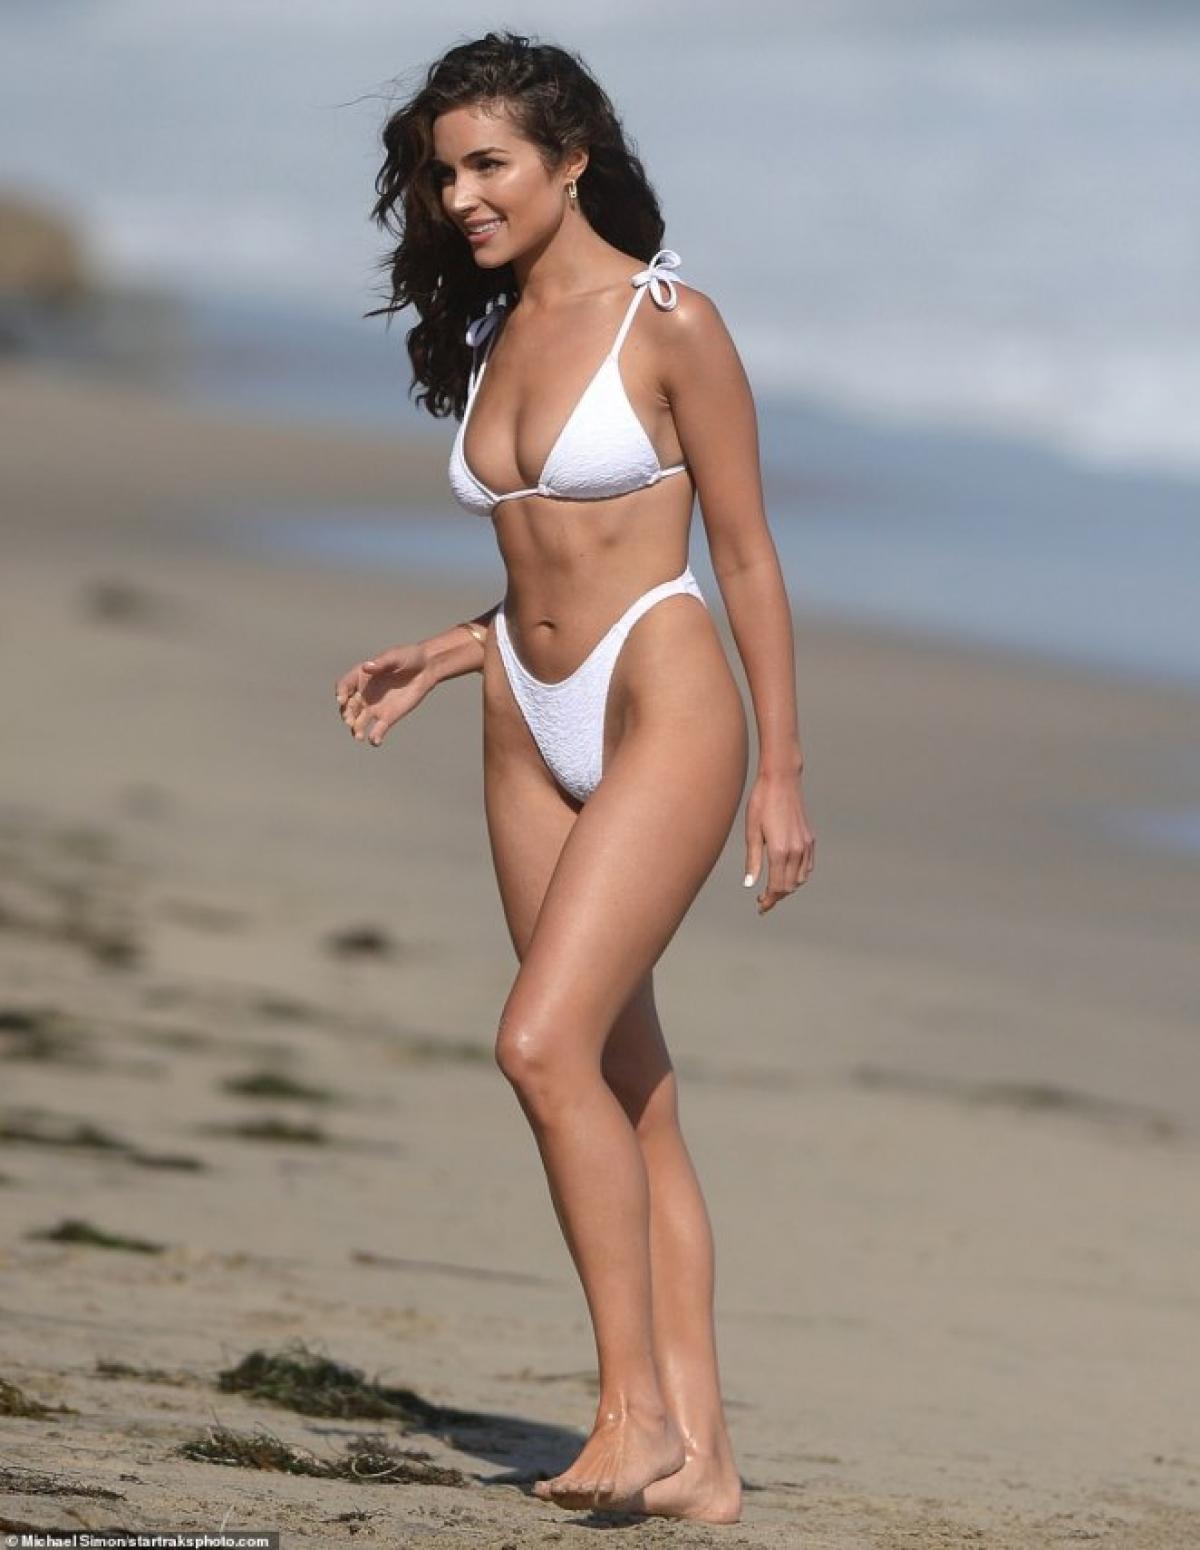 Ở tuổi 29, Olivia Culpo vẫn rất trẻ trung, xinh đẹp.